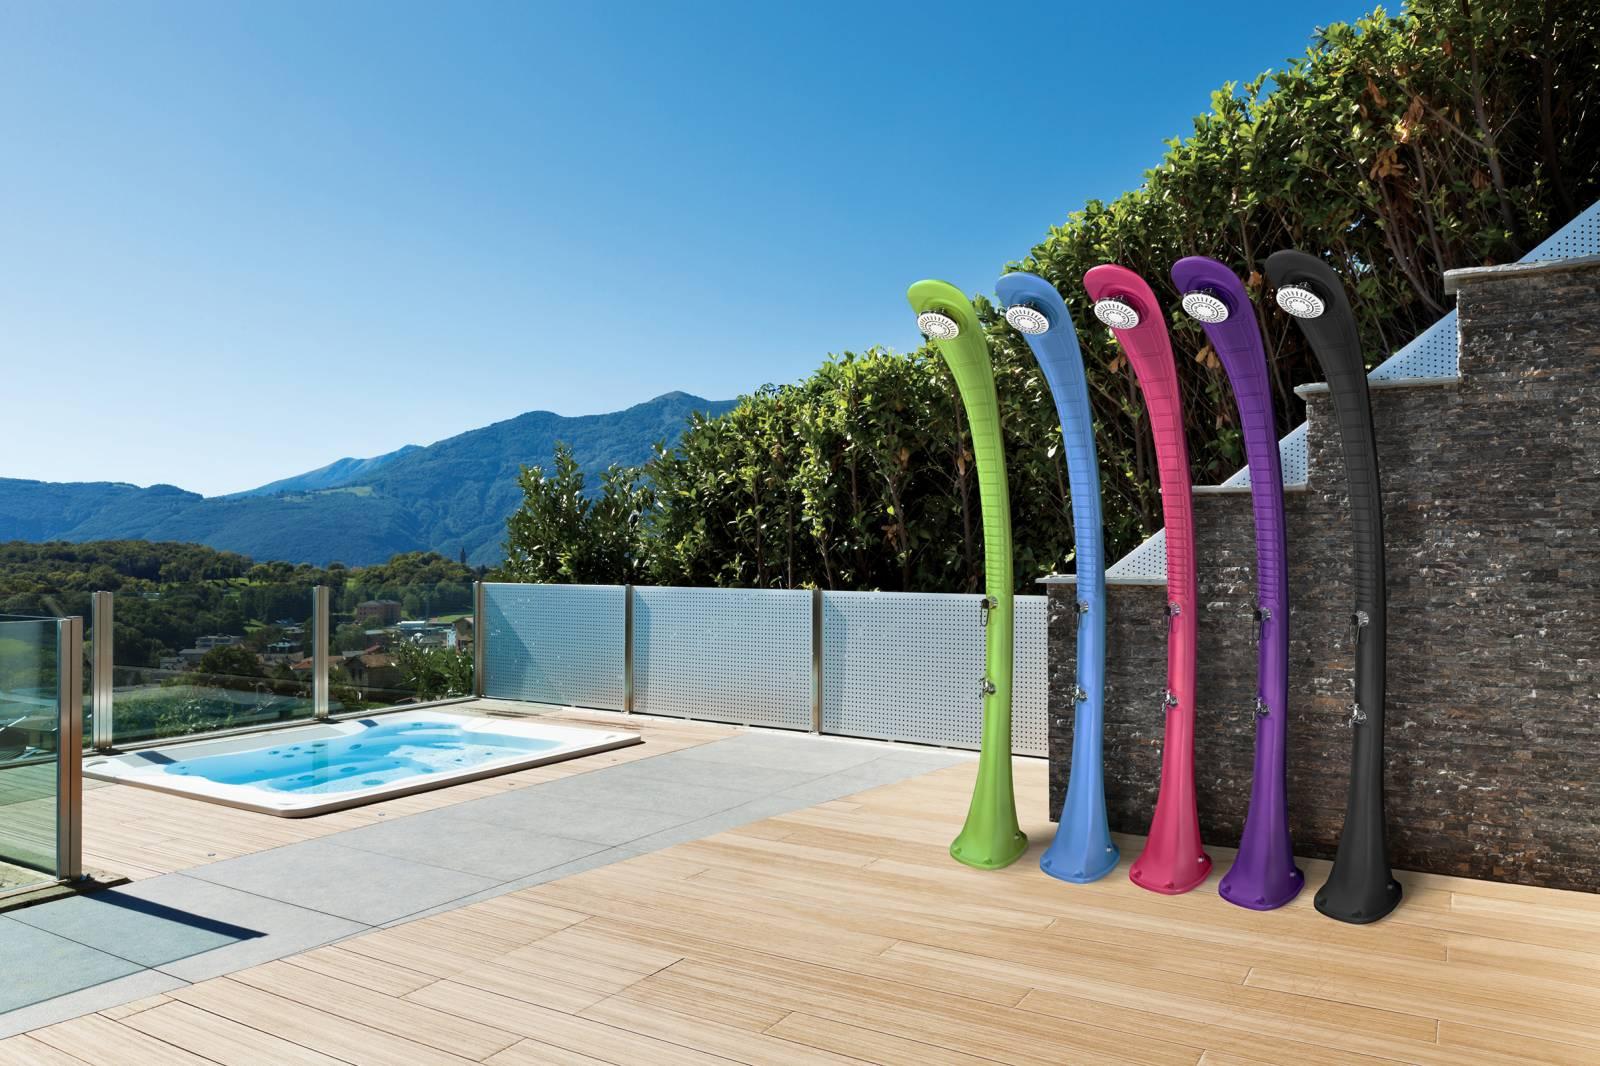 douche solaire ext rieure formidra cobra vente de. Black Bedroom Furniture Sets. Home Design Ideas